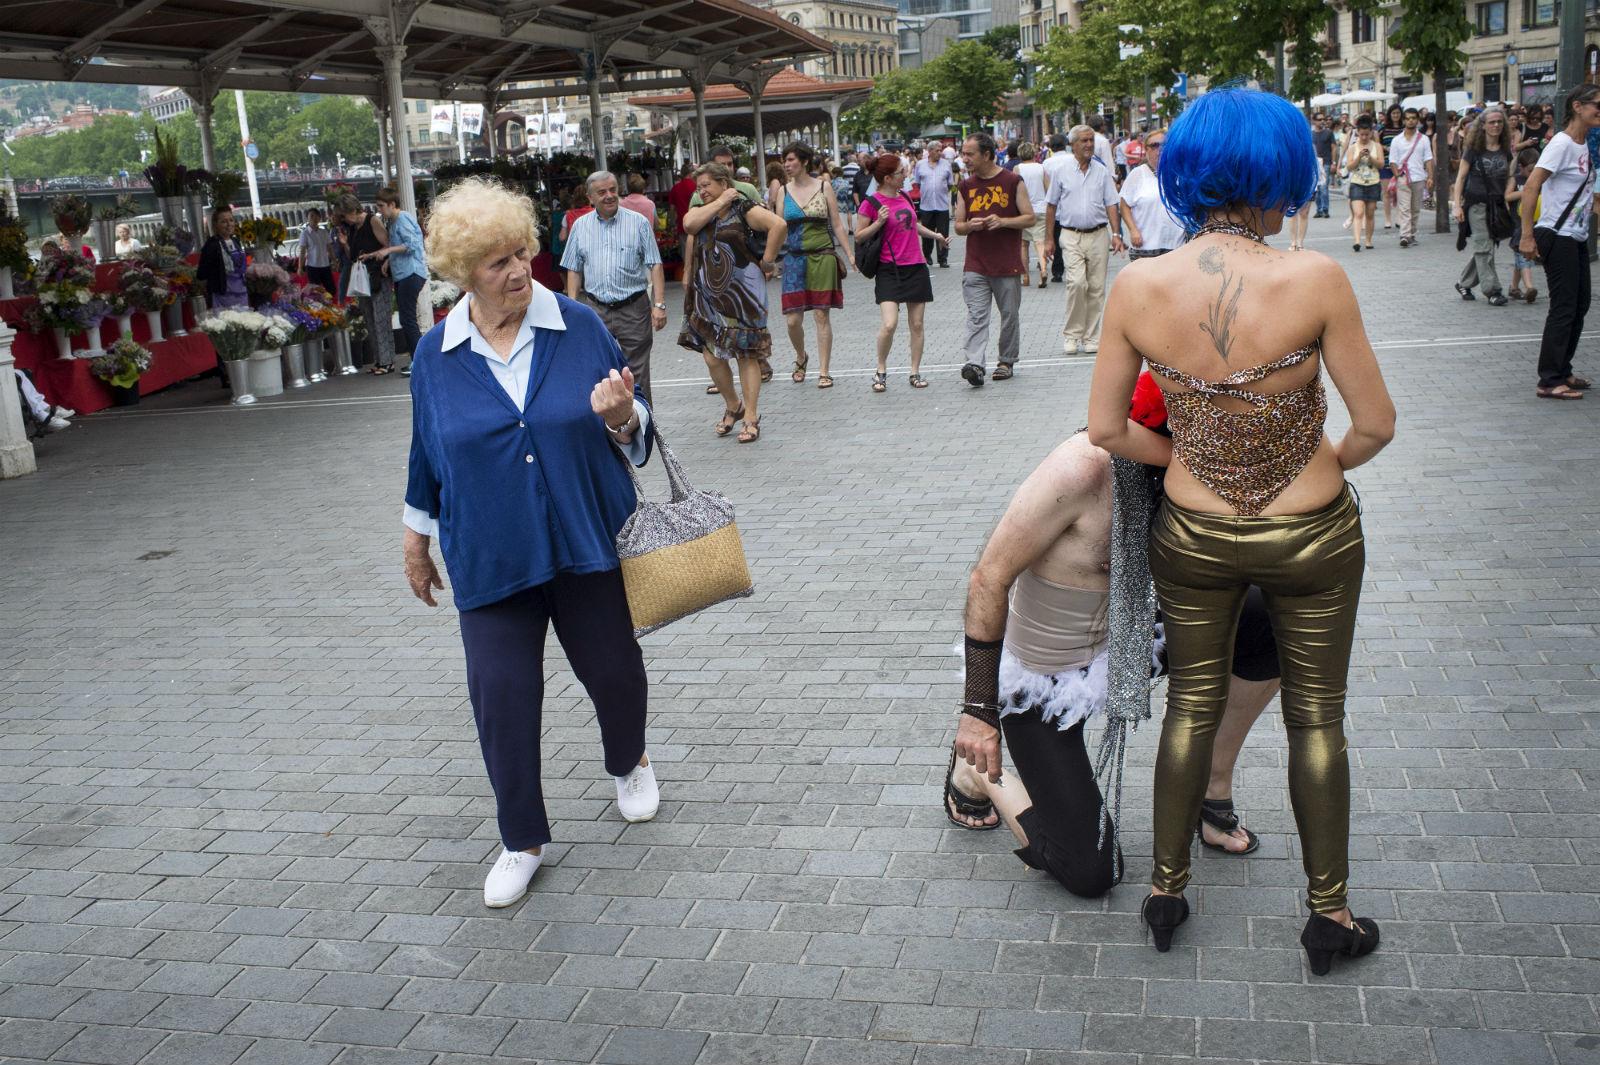 A woman walks past participants at a gay pride in Bilbao